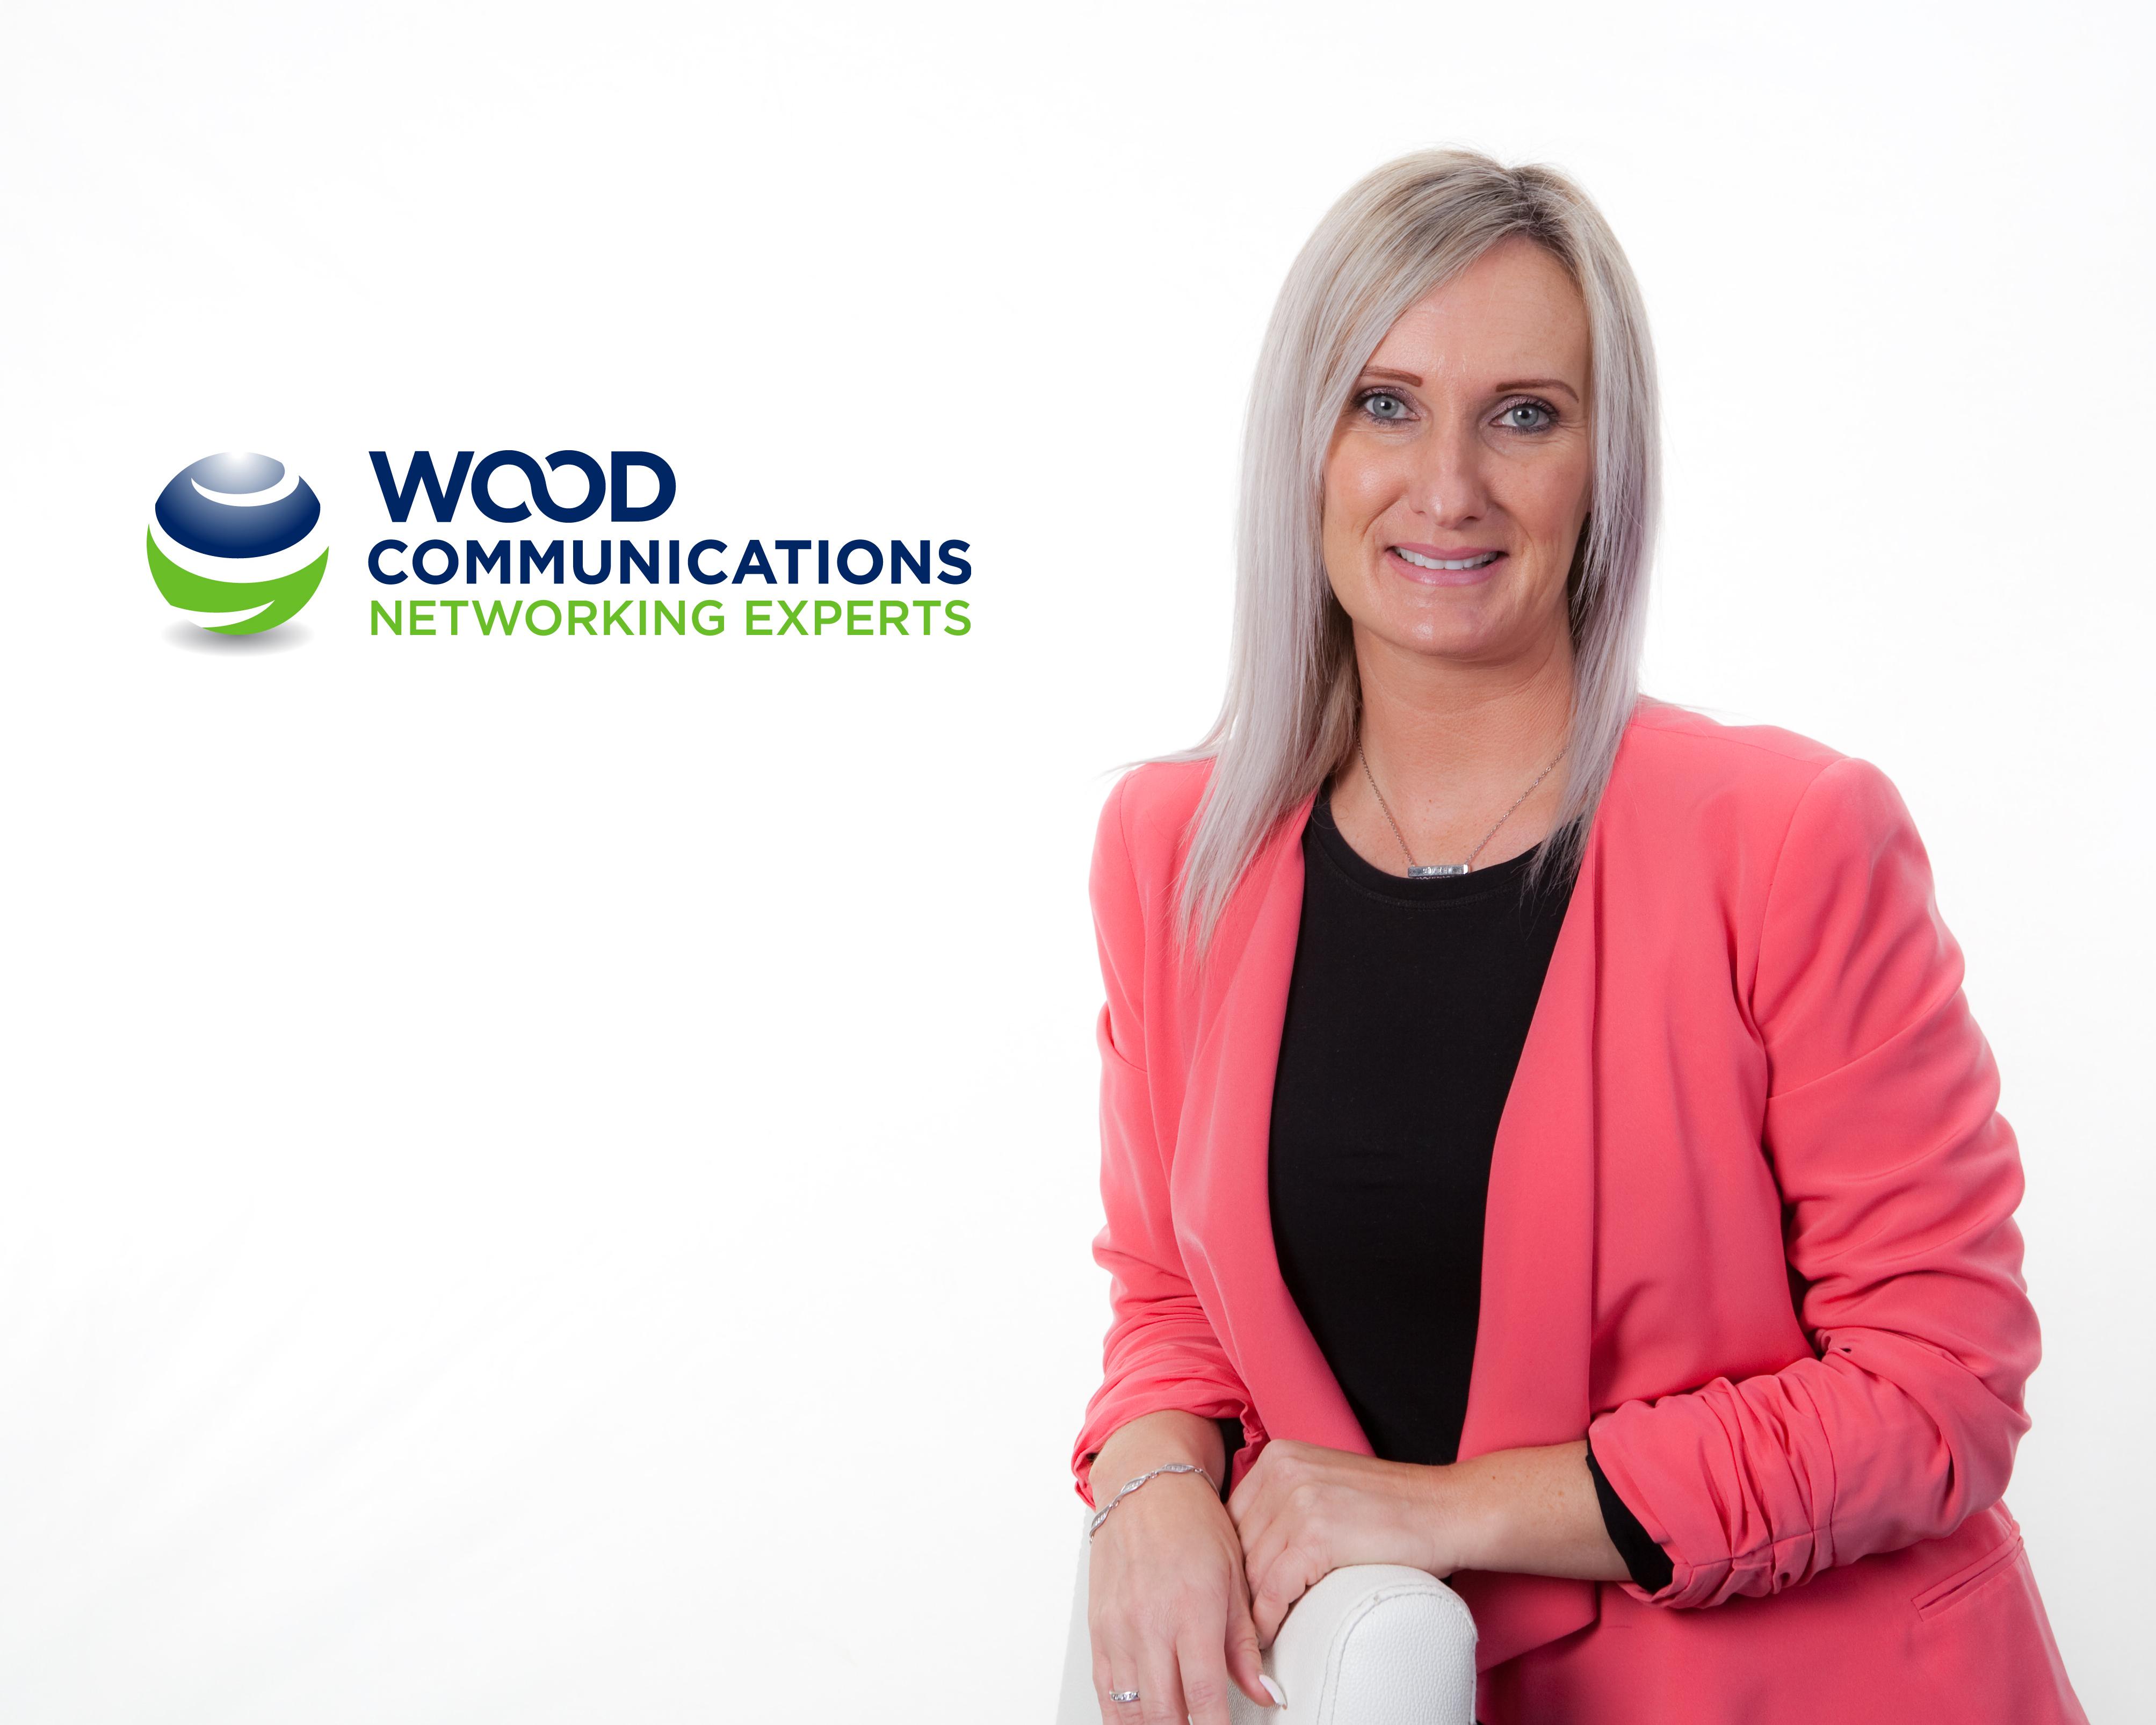 5. Sinead McCarthy - wood communications networking expert